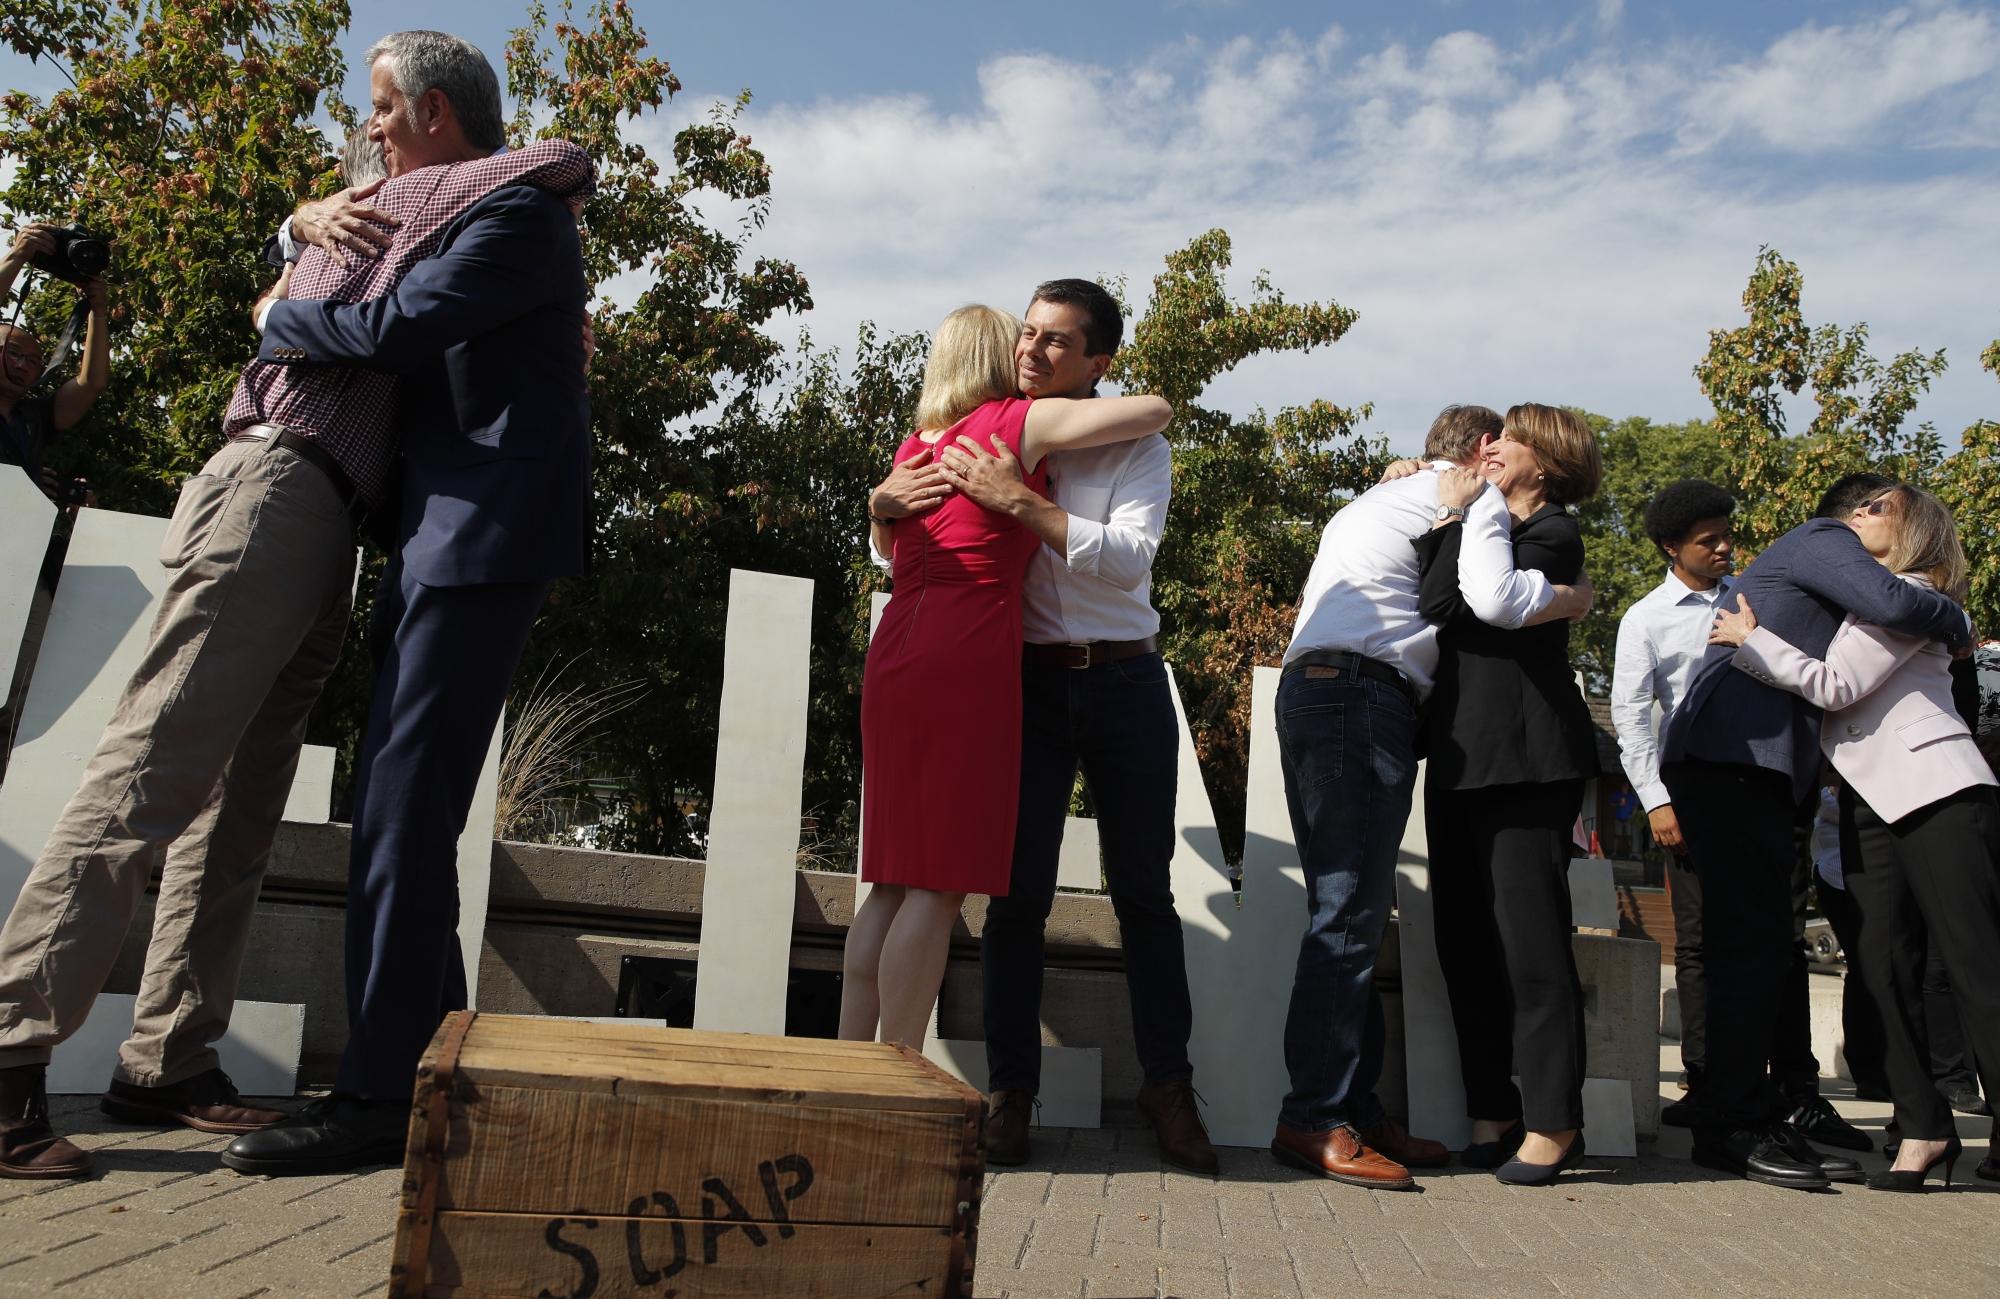 Democratic candidates address gun control at forum in Iowa | WTOP